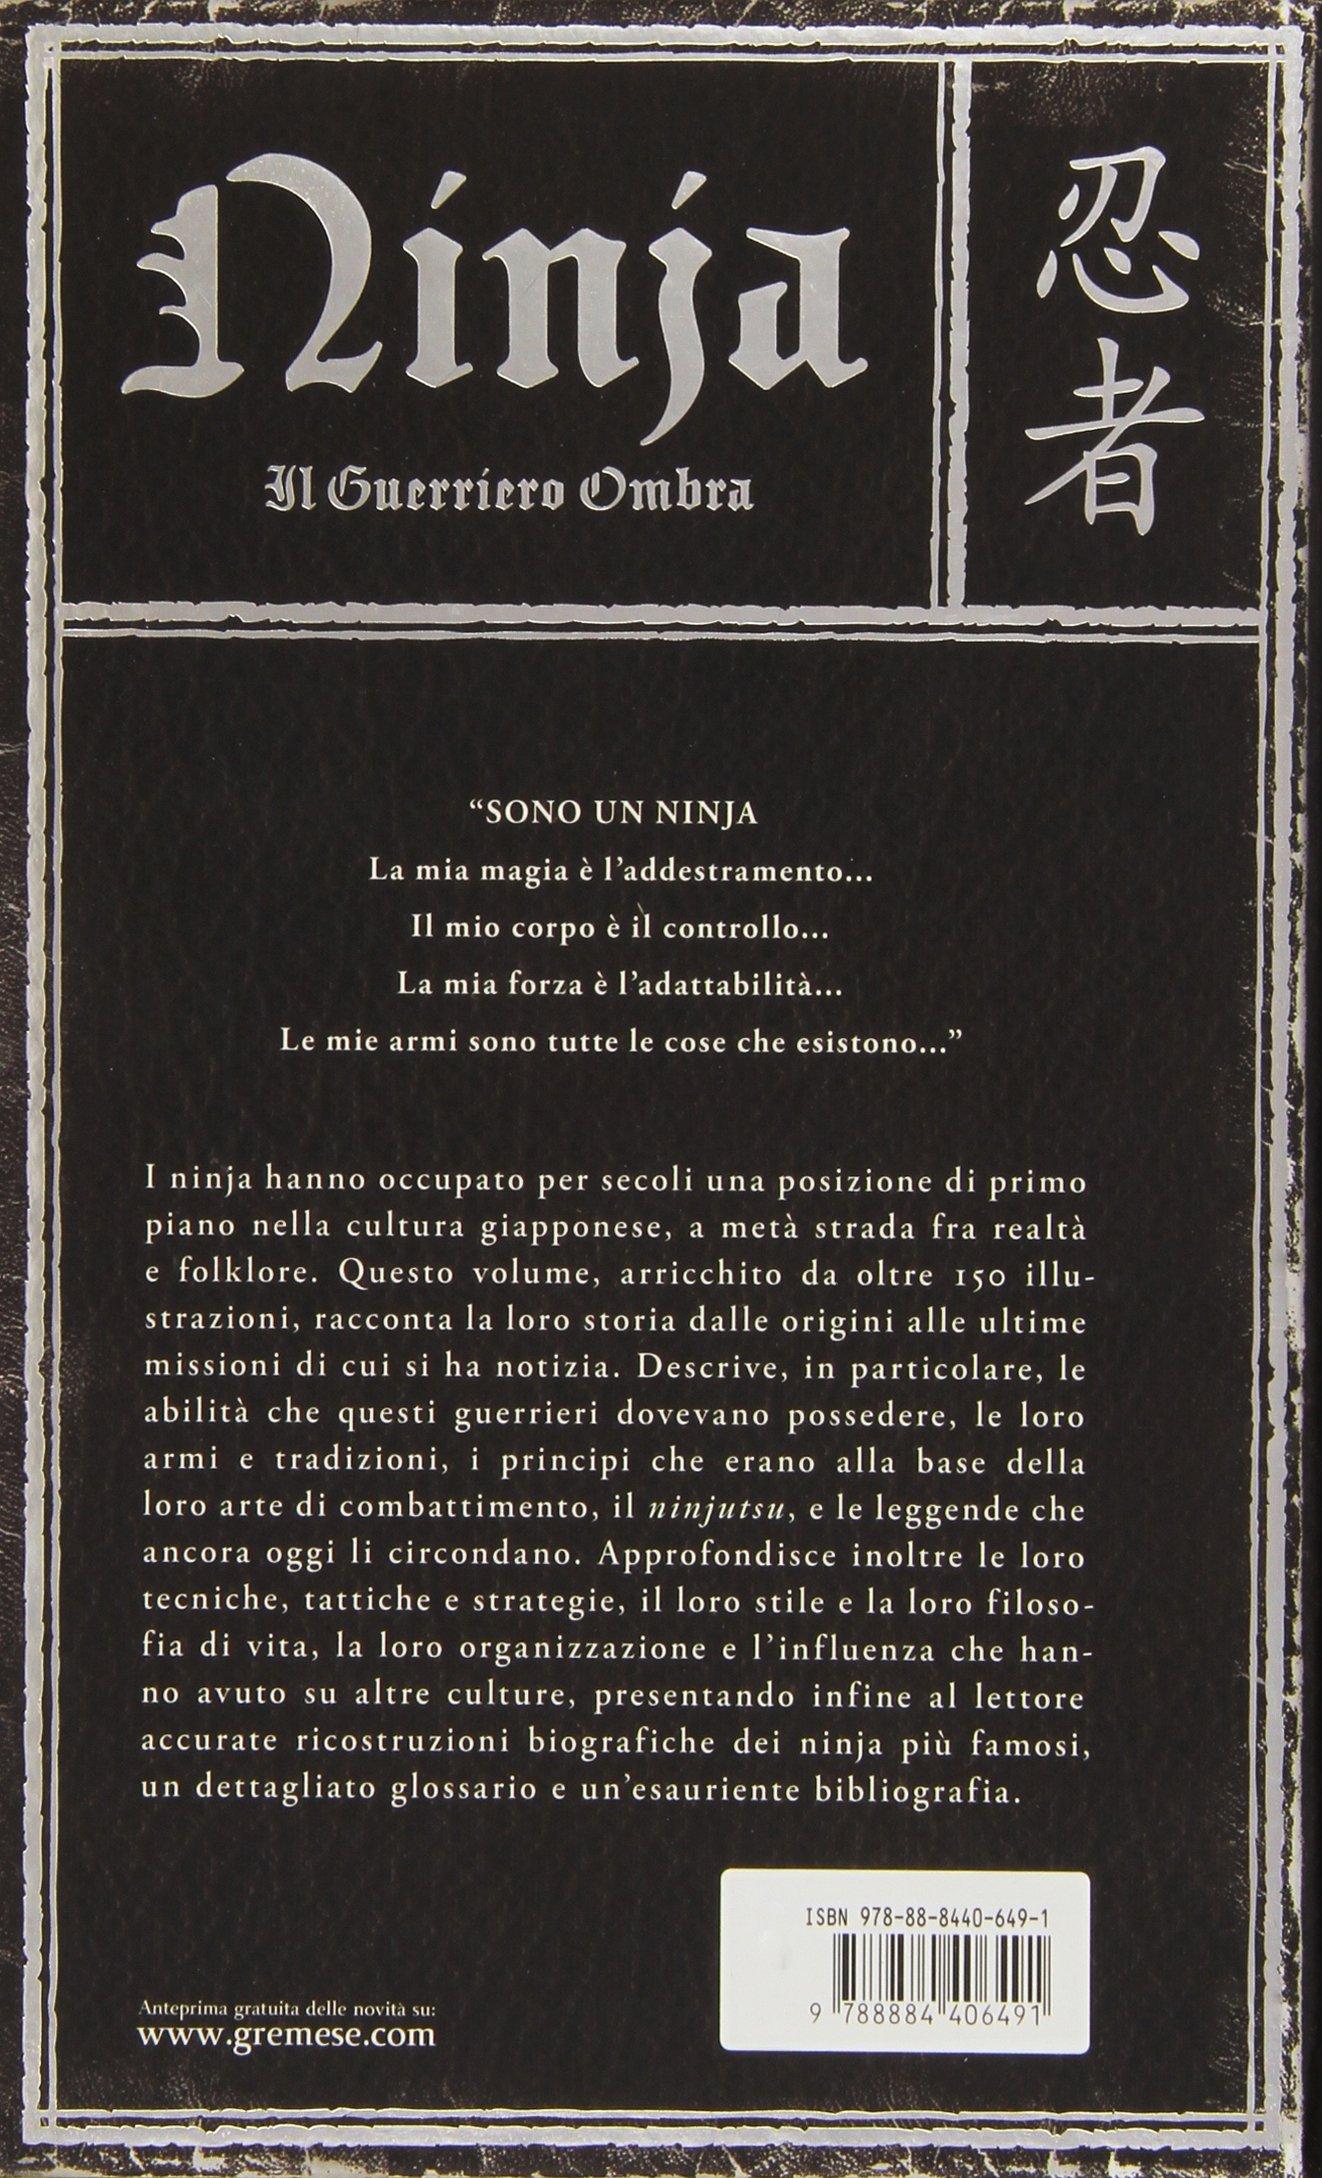 Amazon.com: Ninja. Il guerriero ombra (9788884406491): Books